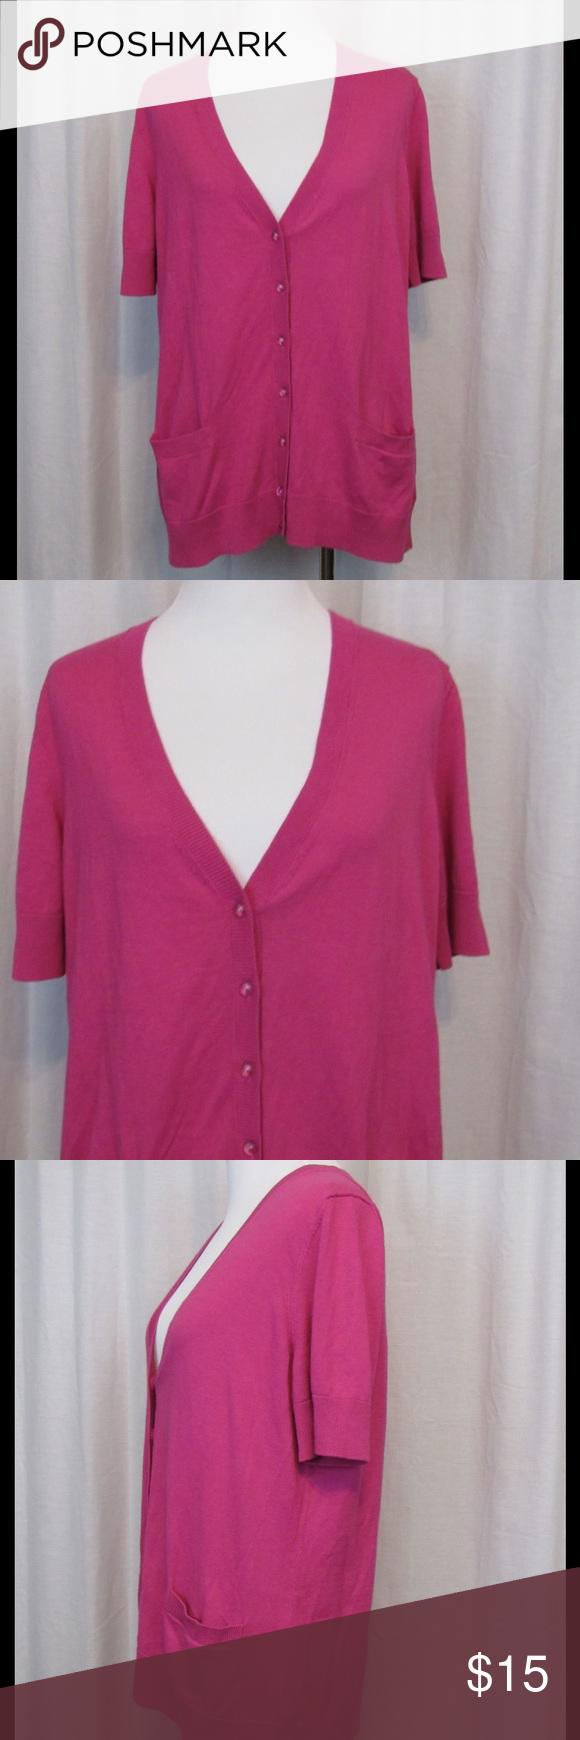 Talbots Pink Short Sleeve Thin Cardigan Top M Brand: Talbots Size ...